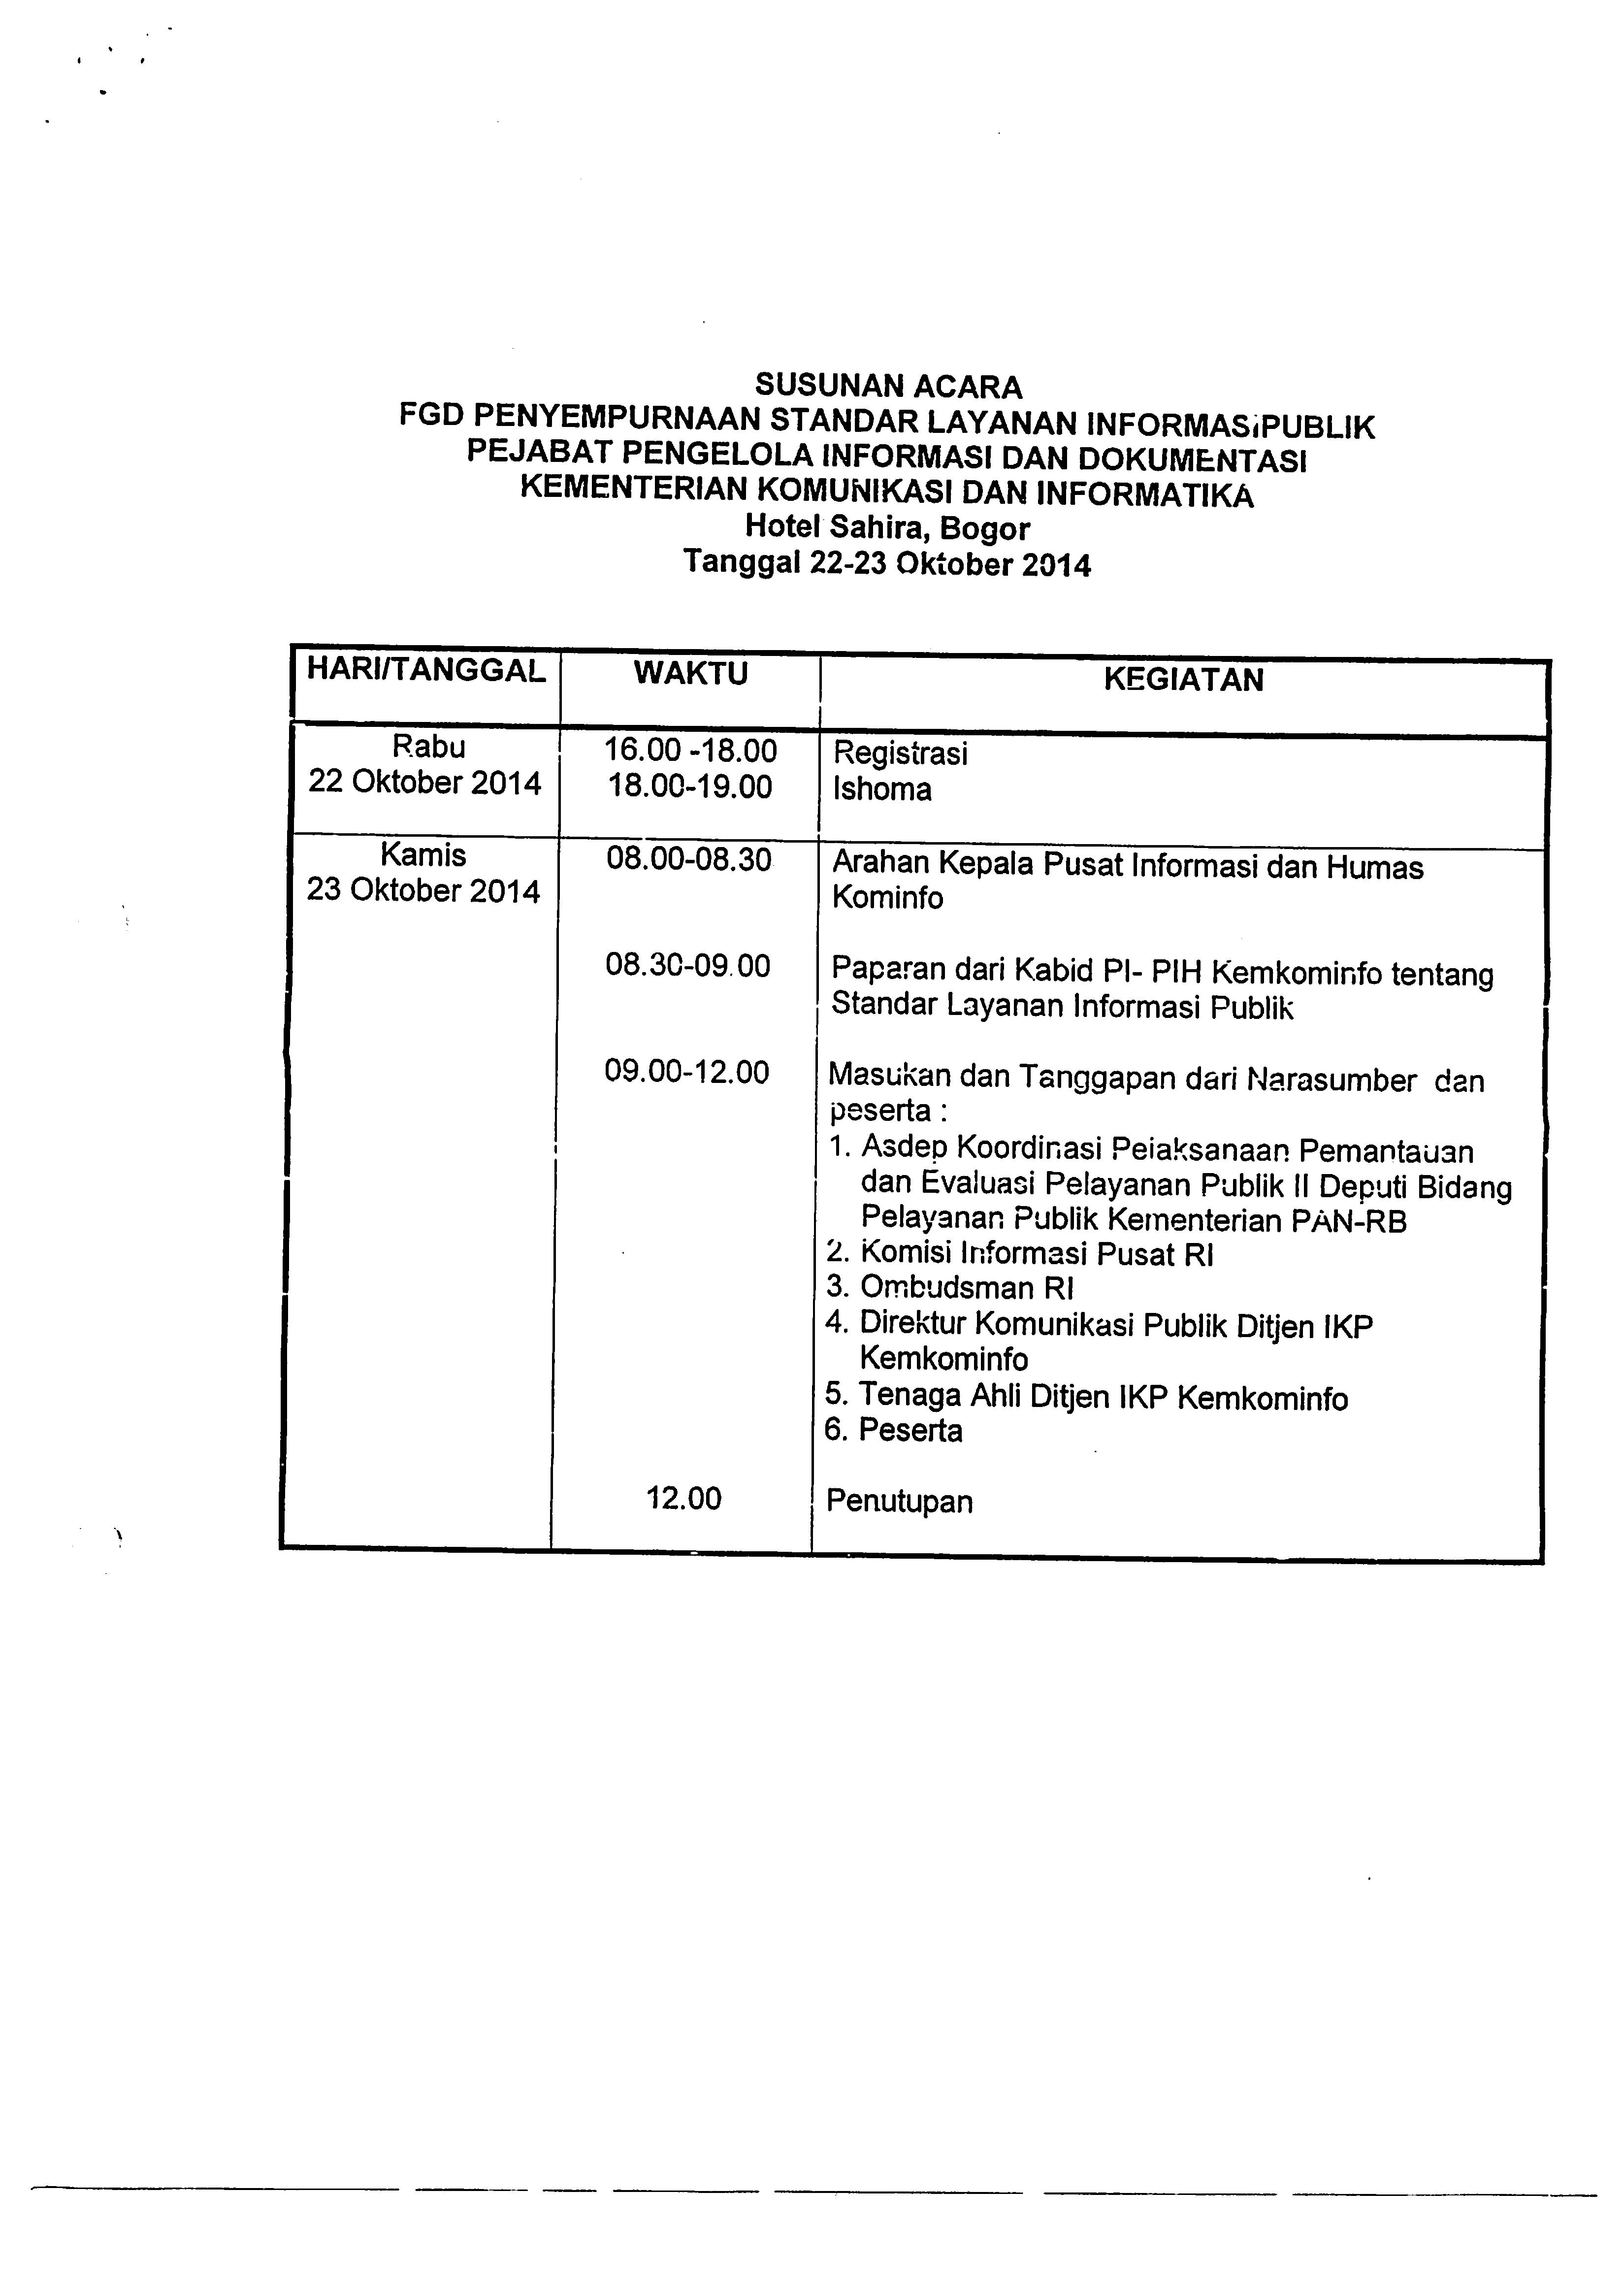 Surat Menyurat Badan Publi2 Ppid Kemkominfo